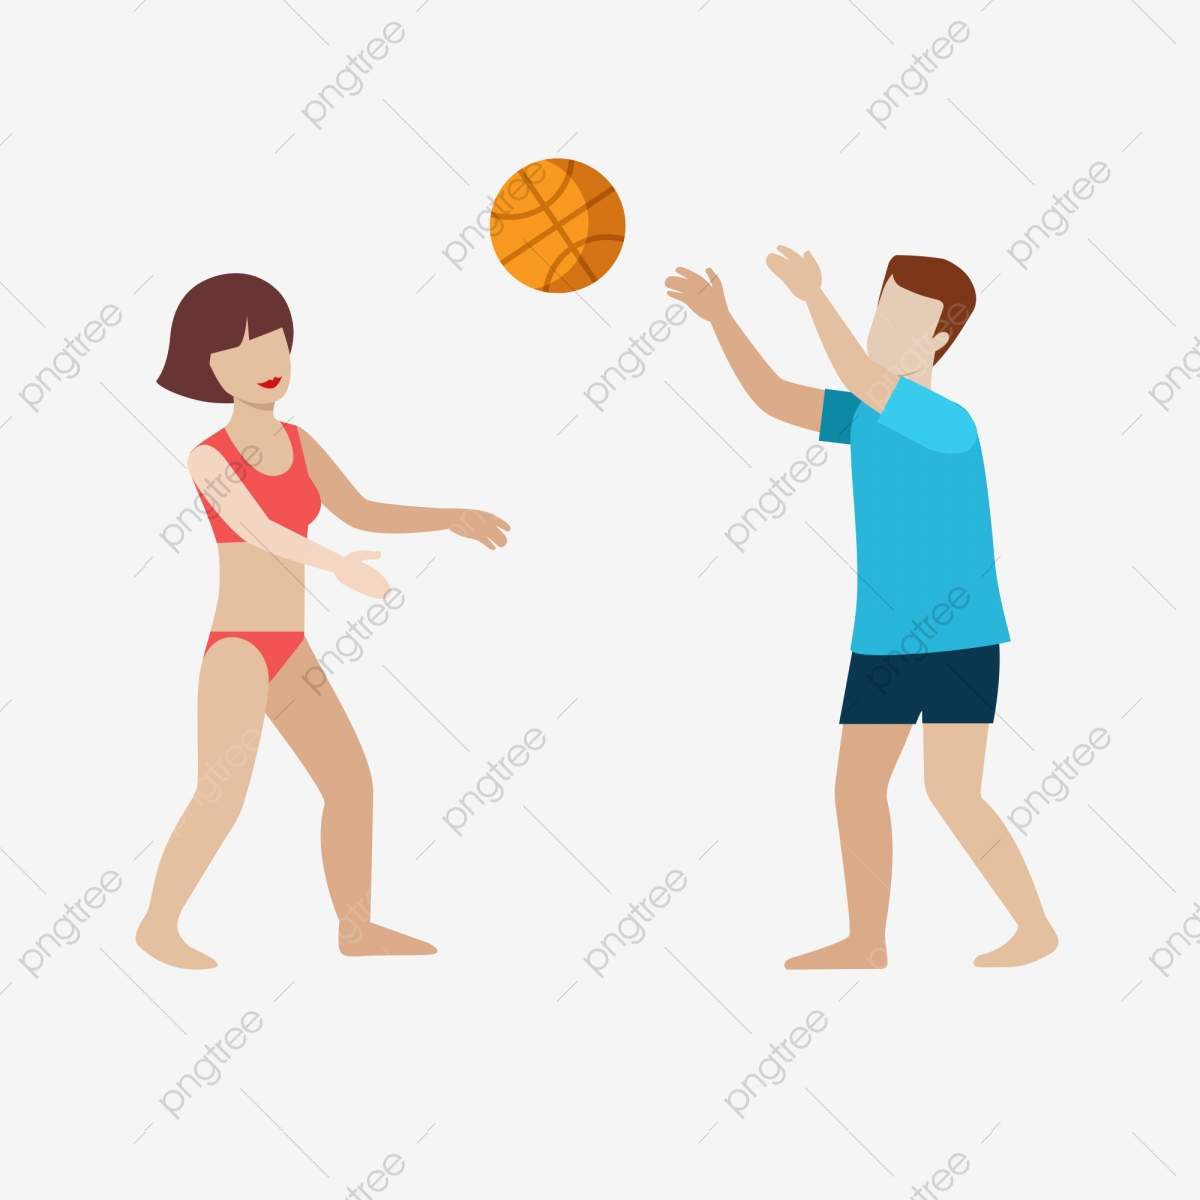 People Playing Basketball On The Beach, Beach, Play Basketball.